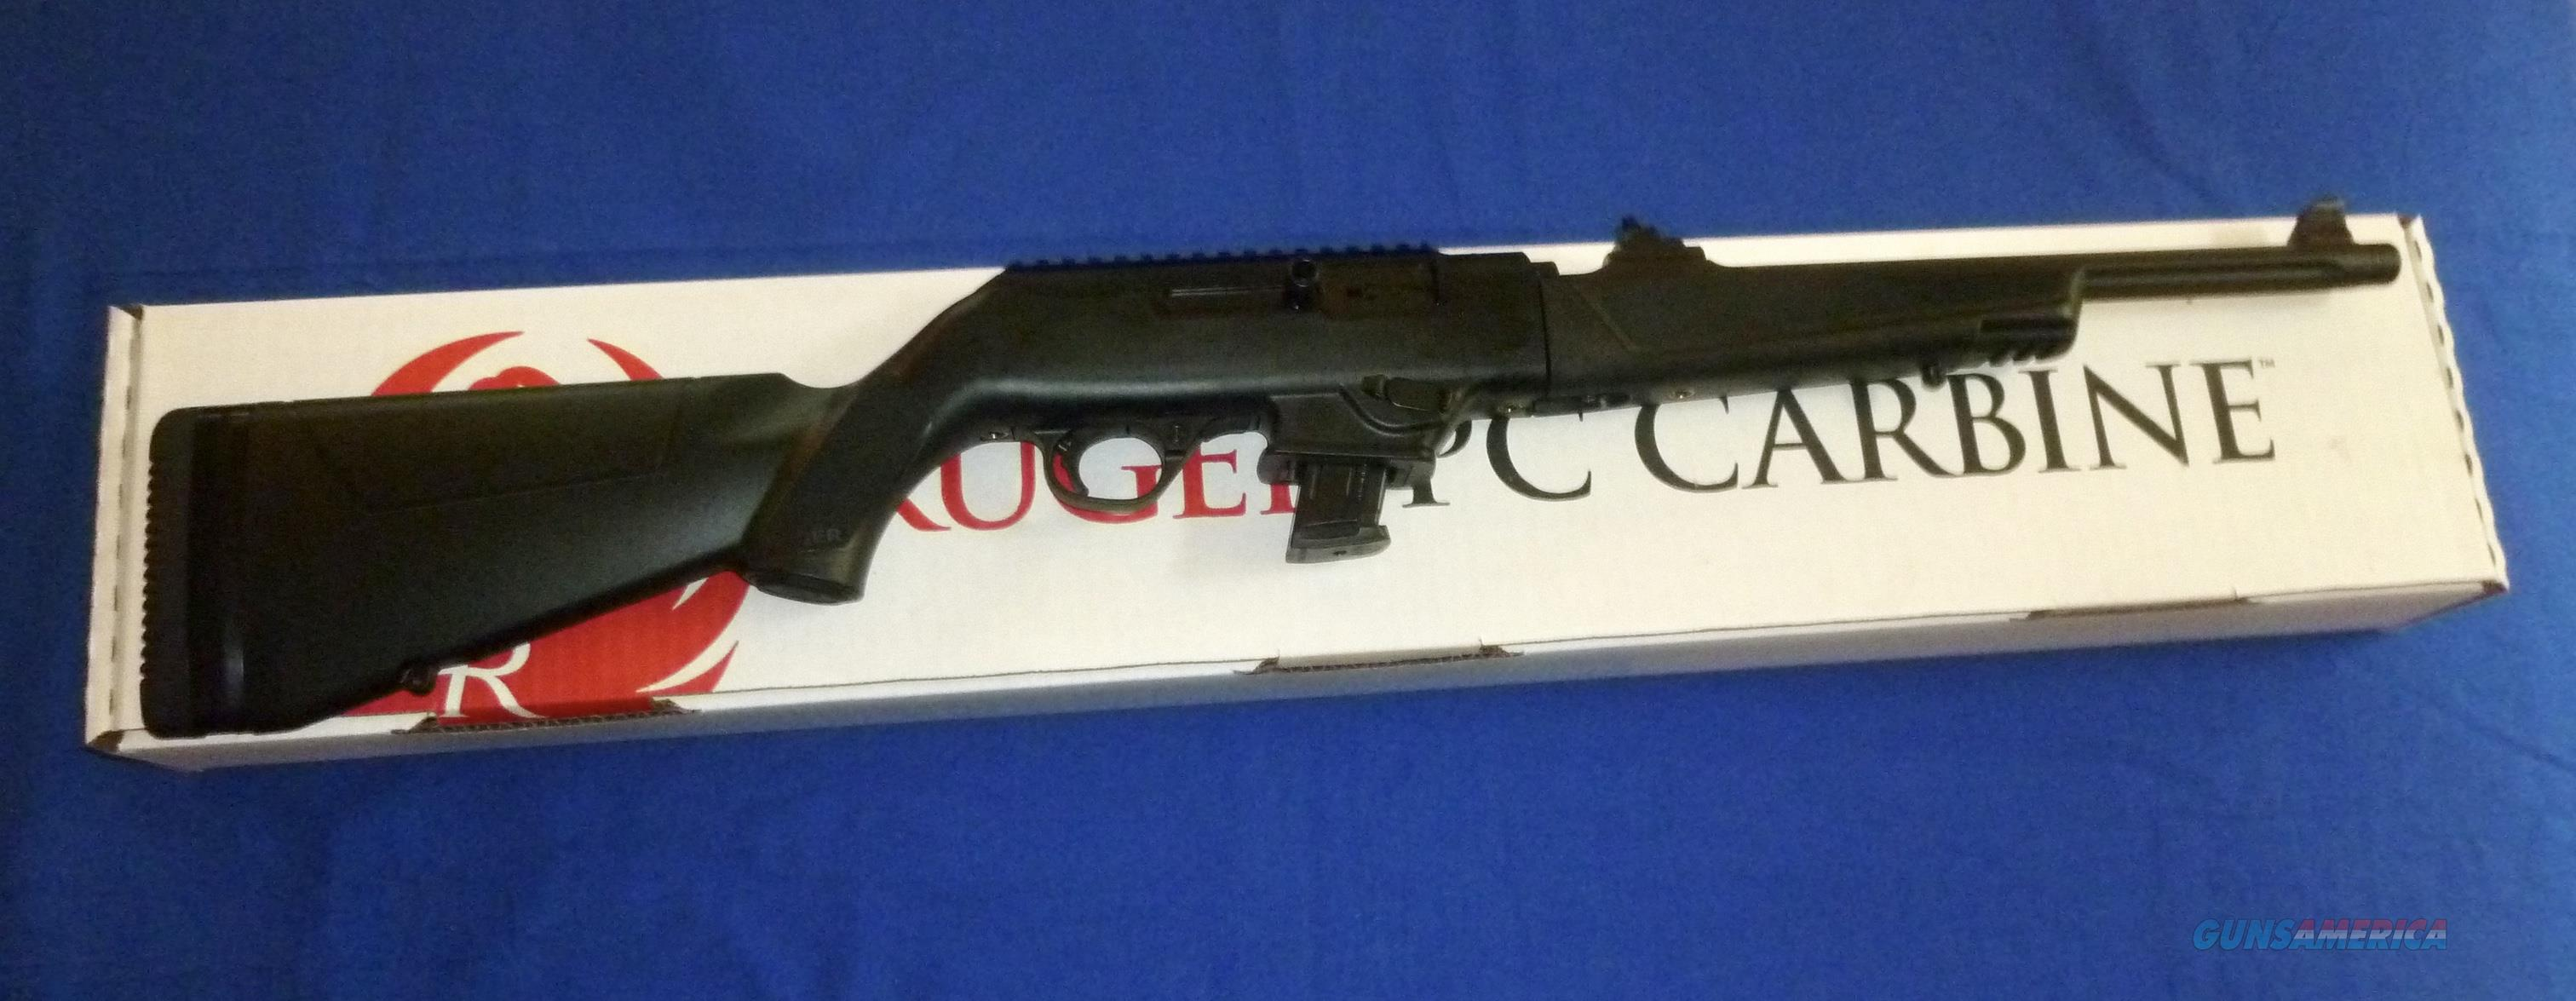 RUGER PC CARBINE 9MM SEMI-AUTO TAKEDOWN RIFLE  Guns > Rifles > Ruger Rifles > M44/Carbine